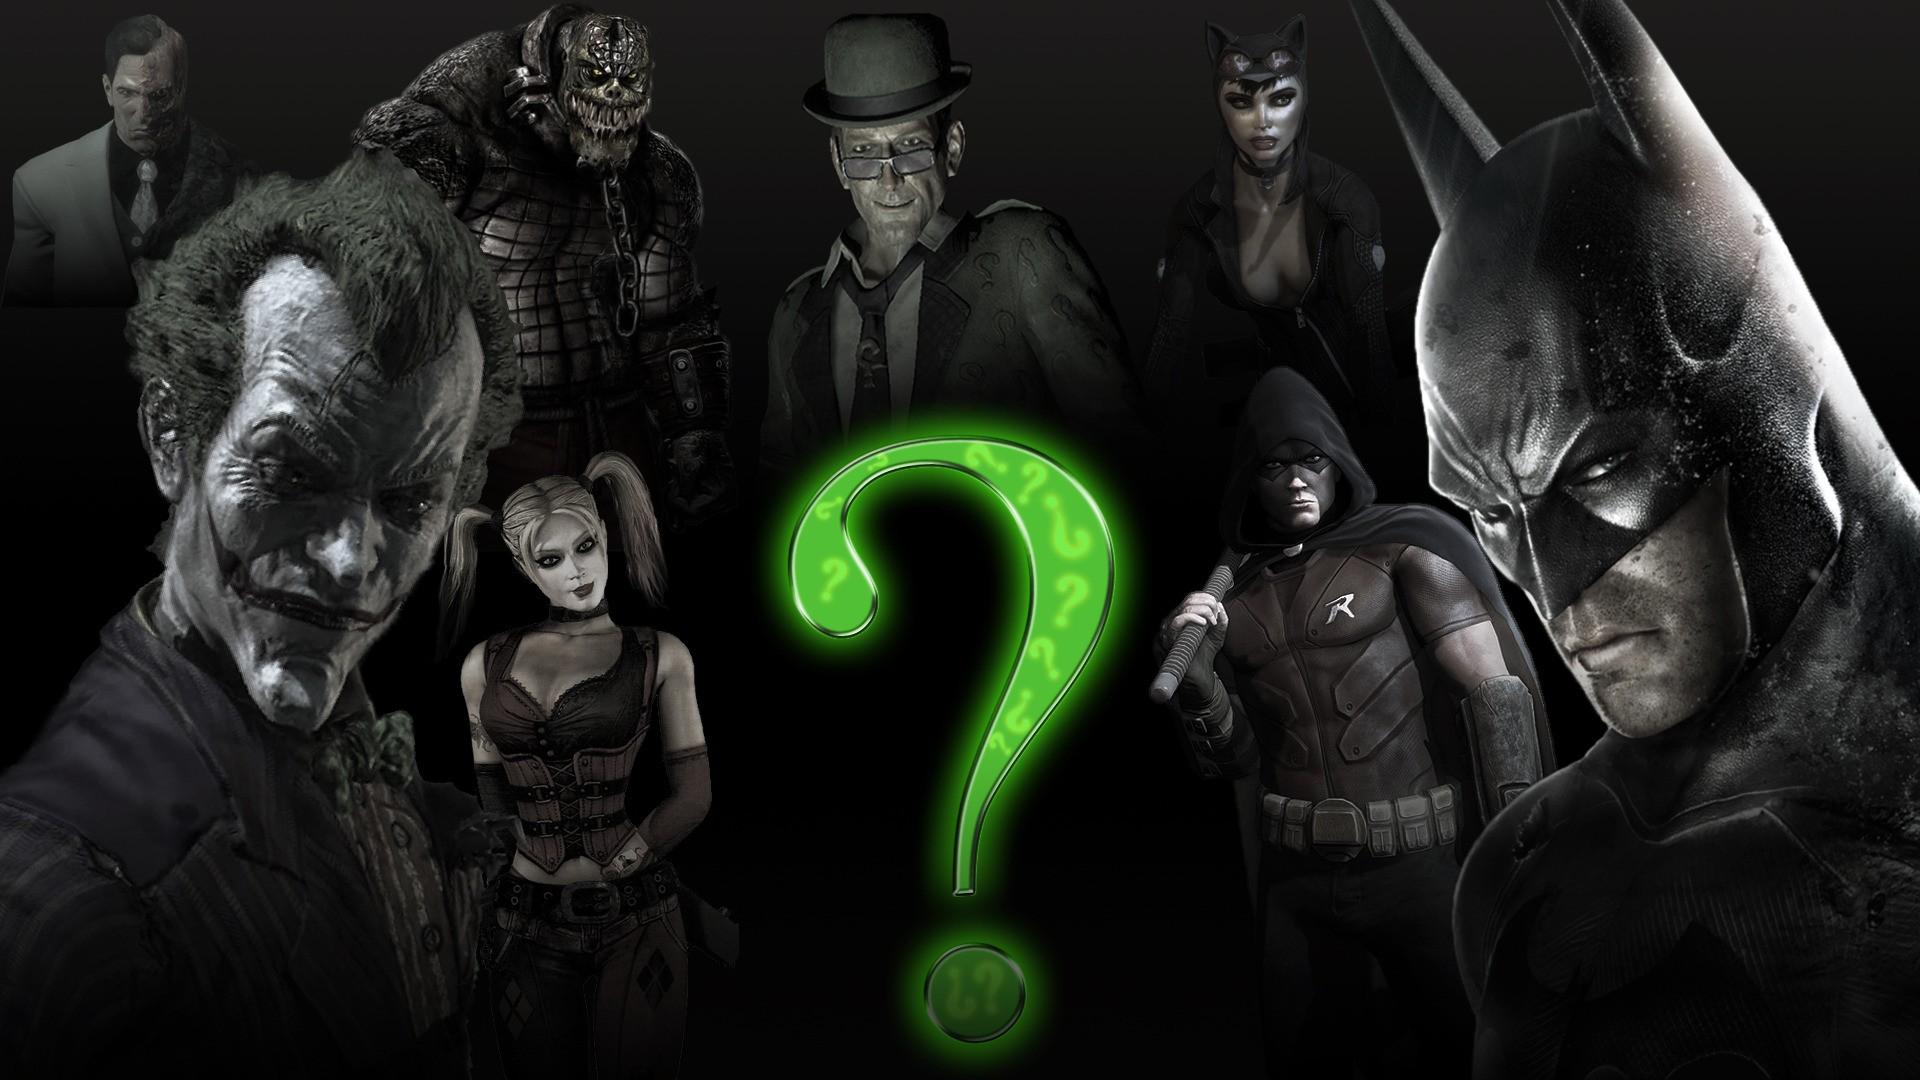 Wallpaper Illustration Video Games Batman Arkham City